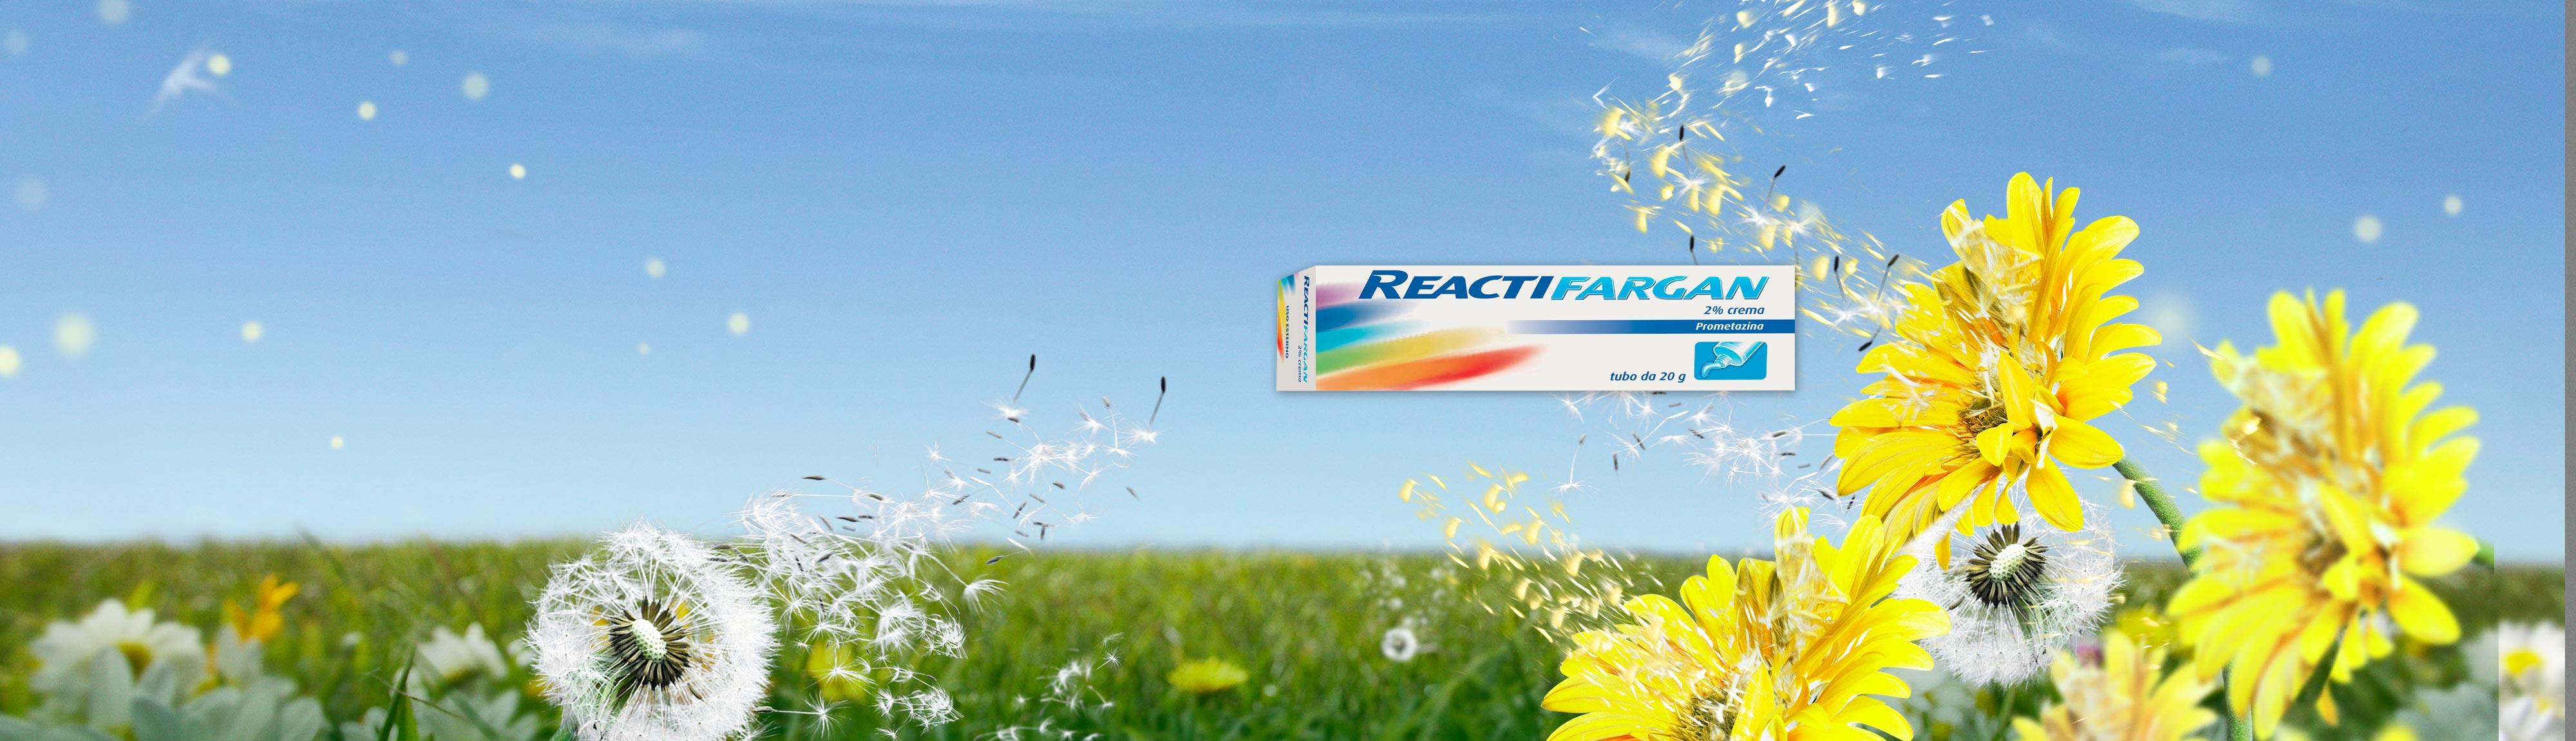 REACTIFARGAN® Antistaminico contro le punture